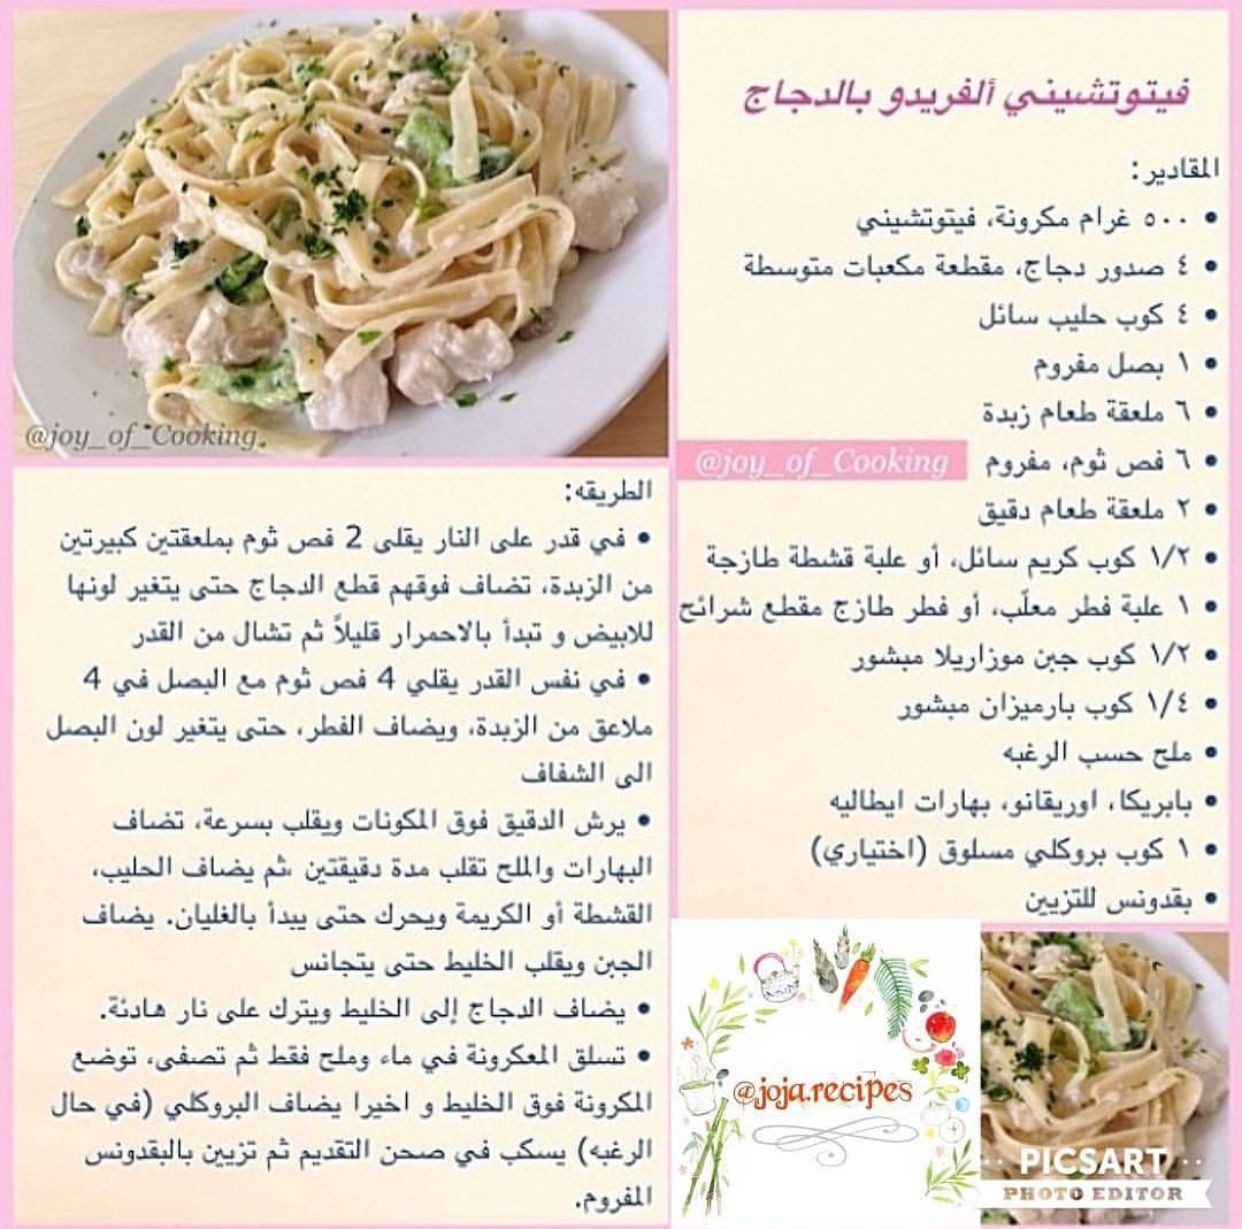 فيتوتشيني الفريدو بالدجاج Cooking Recipes Recipes Cooking